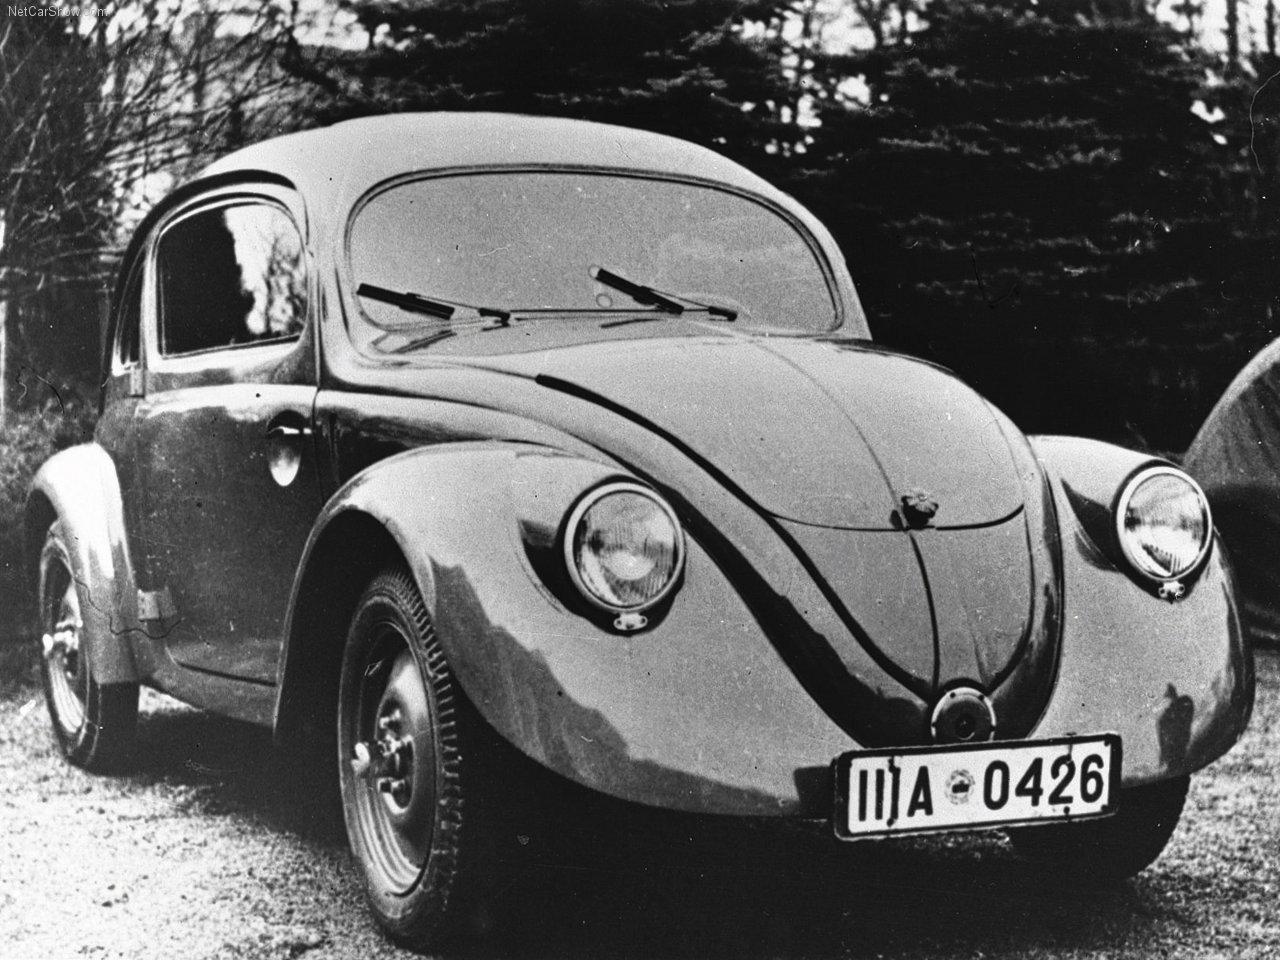 Exemplar de 1938 do Volkswagen Fusca, chamado de VW Sedan ou Käfer na Alemanha